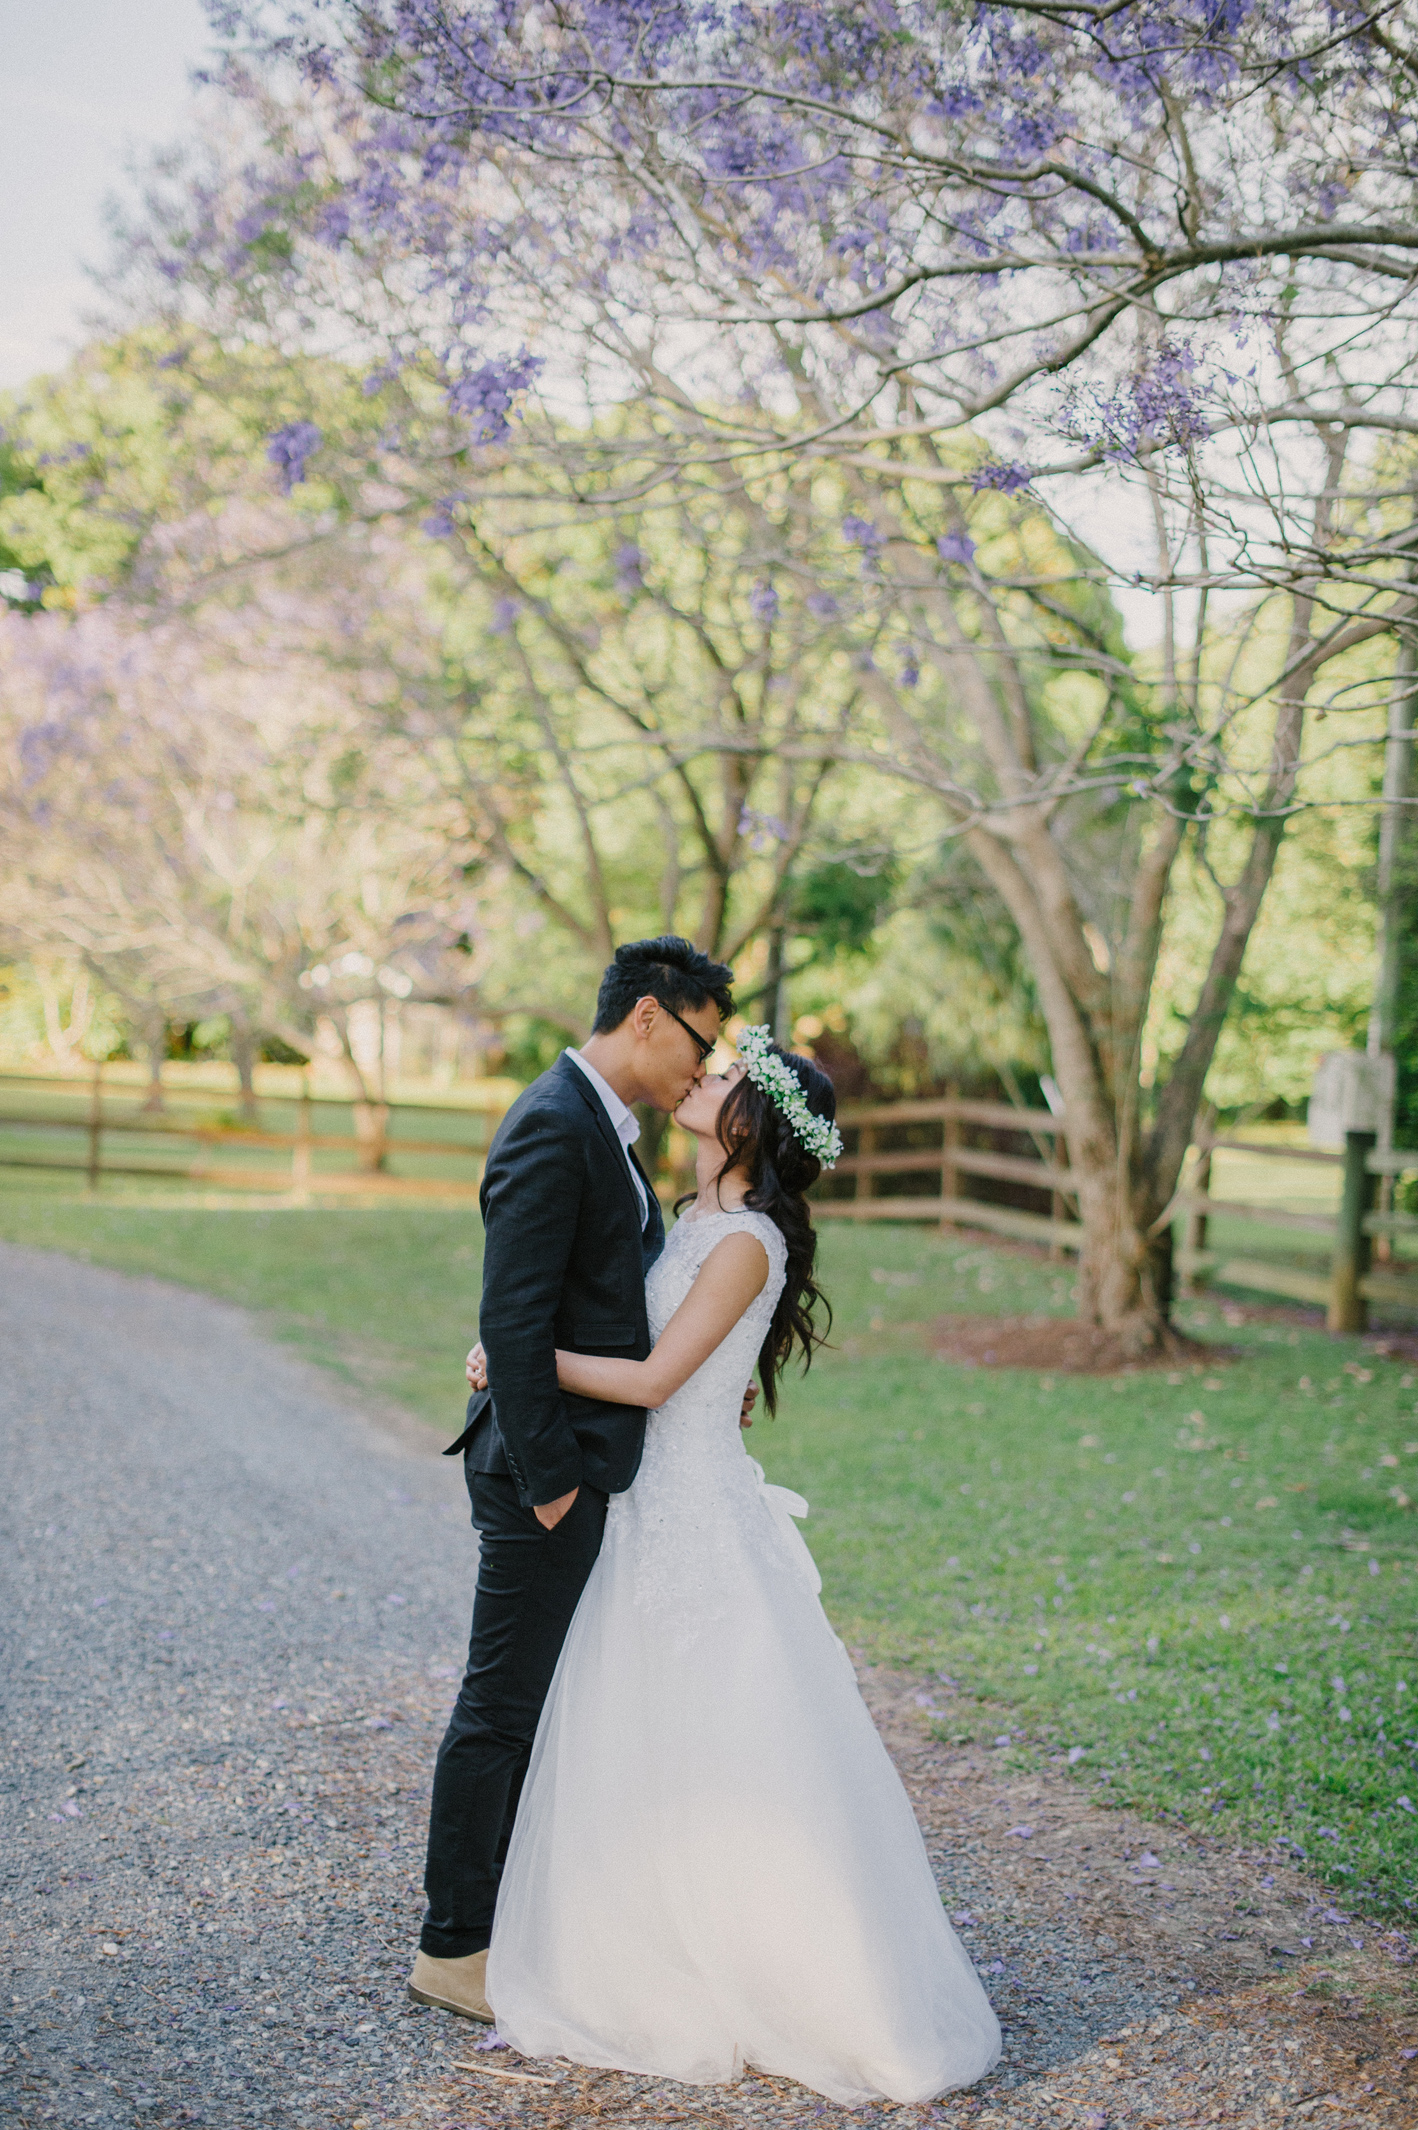 005-ed-janet-currumbin-wedding_sophie-baker-photography